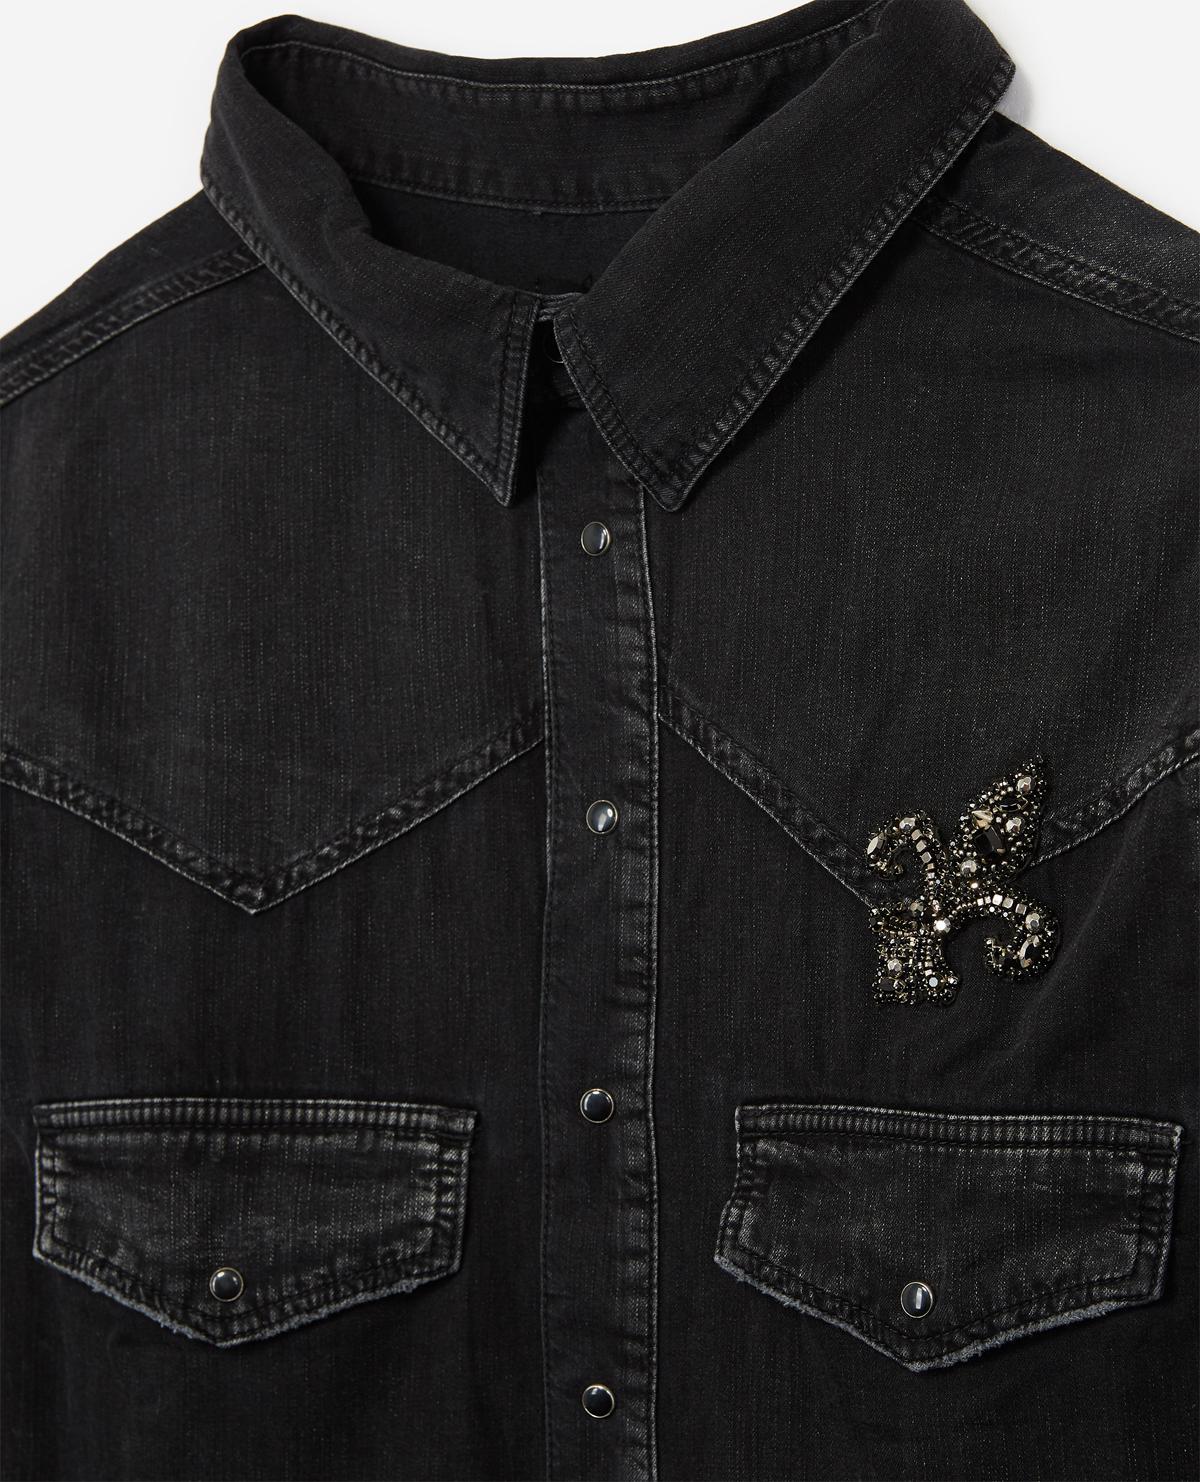 4a73165548 Lyst - The Kooples Denim Shirt With Medium Black Fleur De Lys Patch in Black